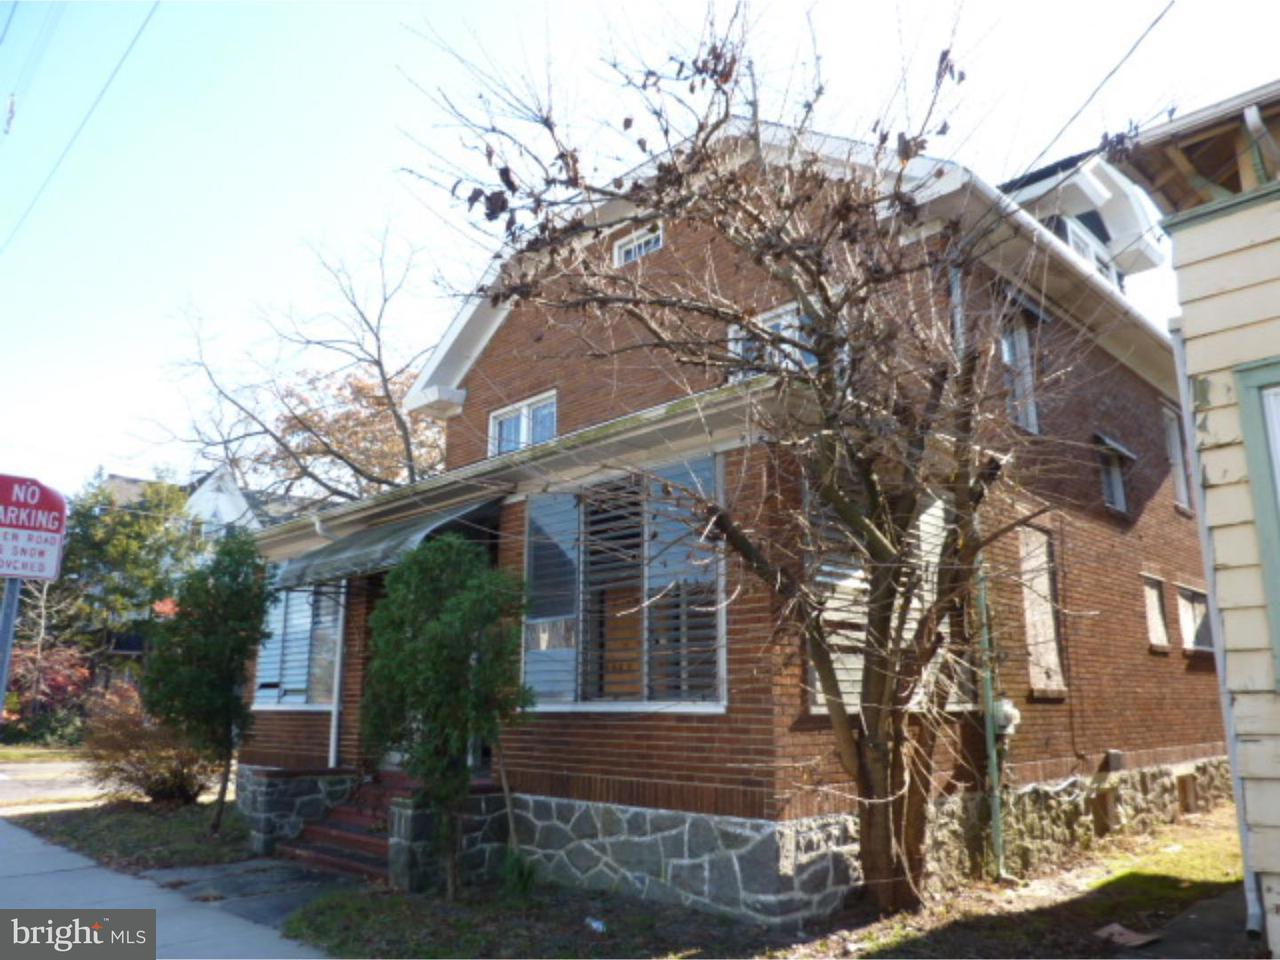 323 E MAIN Street  Millville, New Jersey 08332 United States